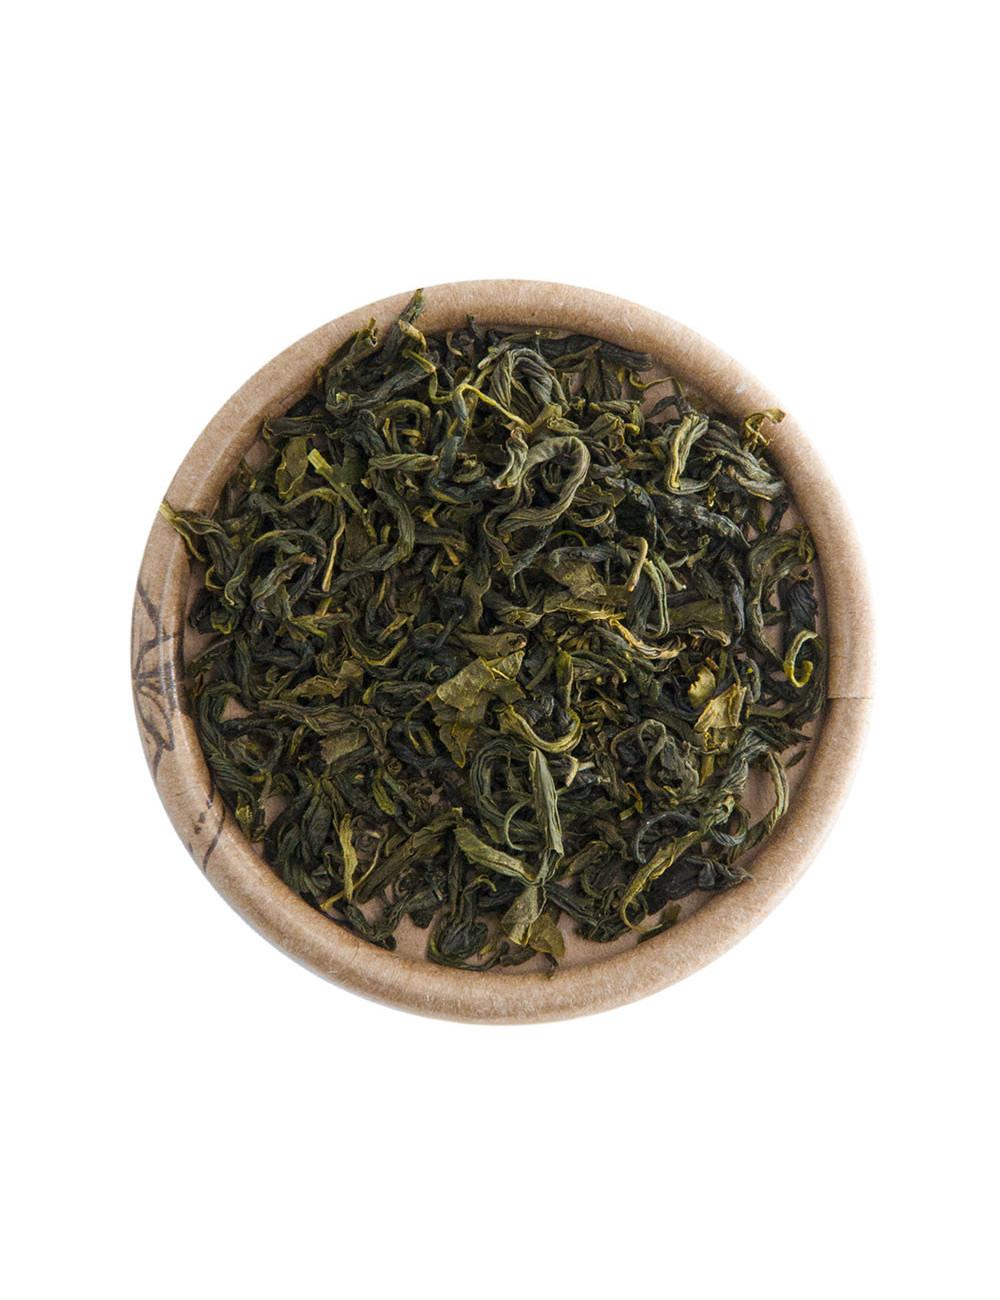 "Korea ""Joongjak"" Plus BIO tè verde - La Pianta del Tè shop online"